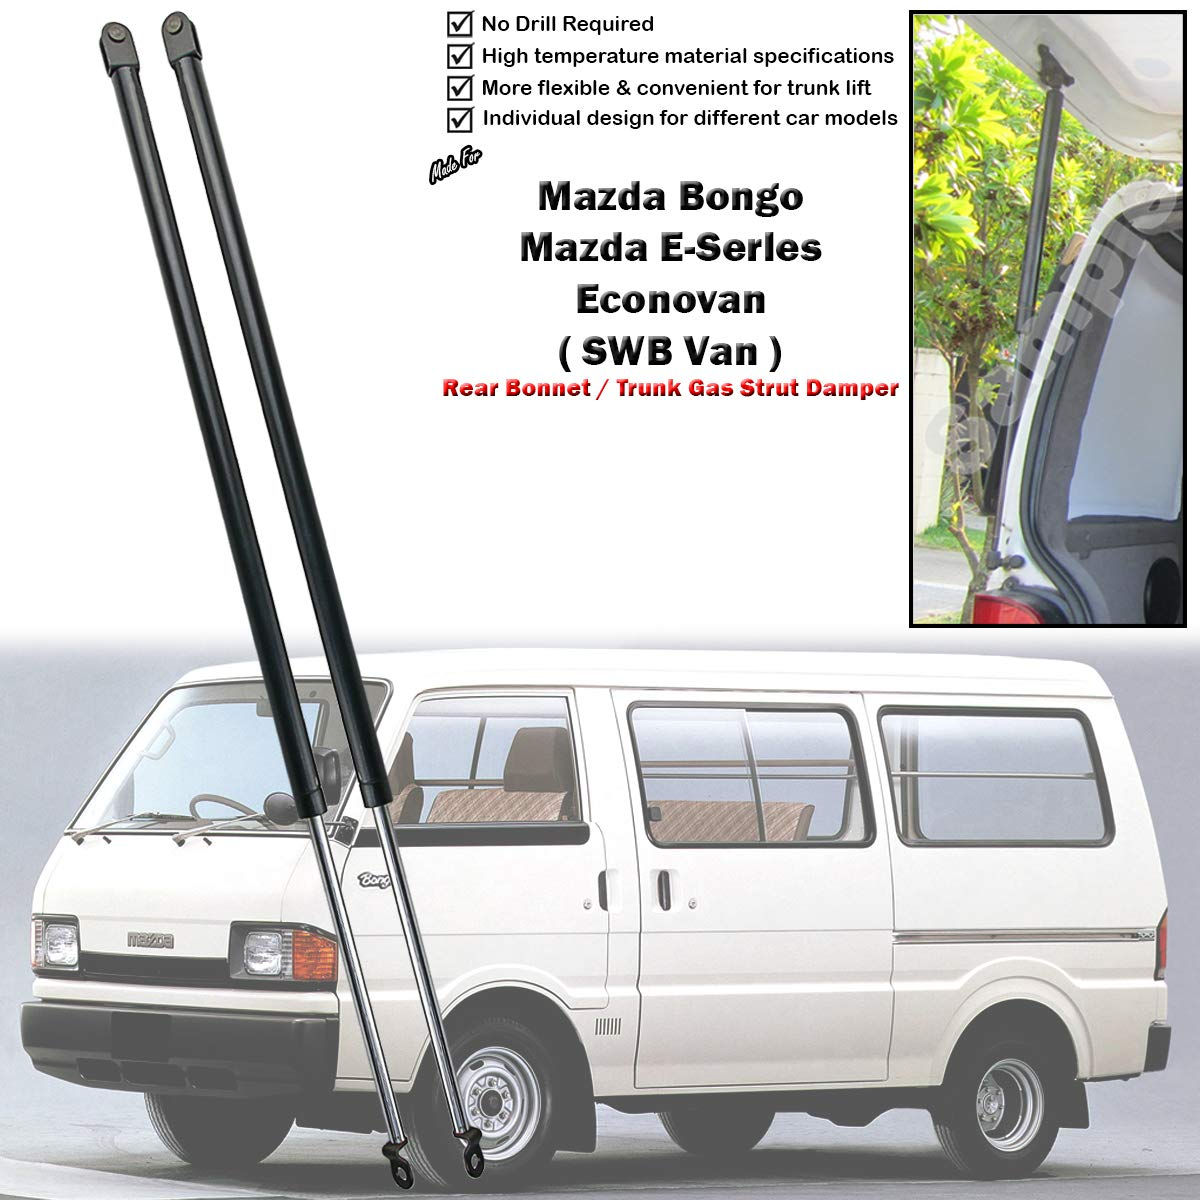 [DIAGRAM_3US]  33BF Mazda E2000 Van Fuse Box | Wiring Library | Mazda E2000 Main Fuse Box |  | Wiring Library